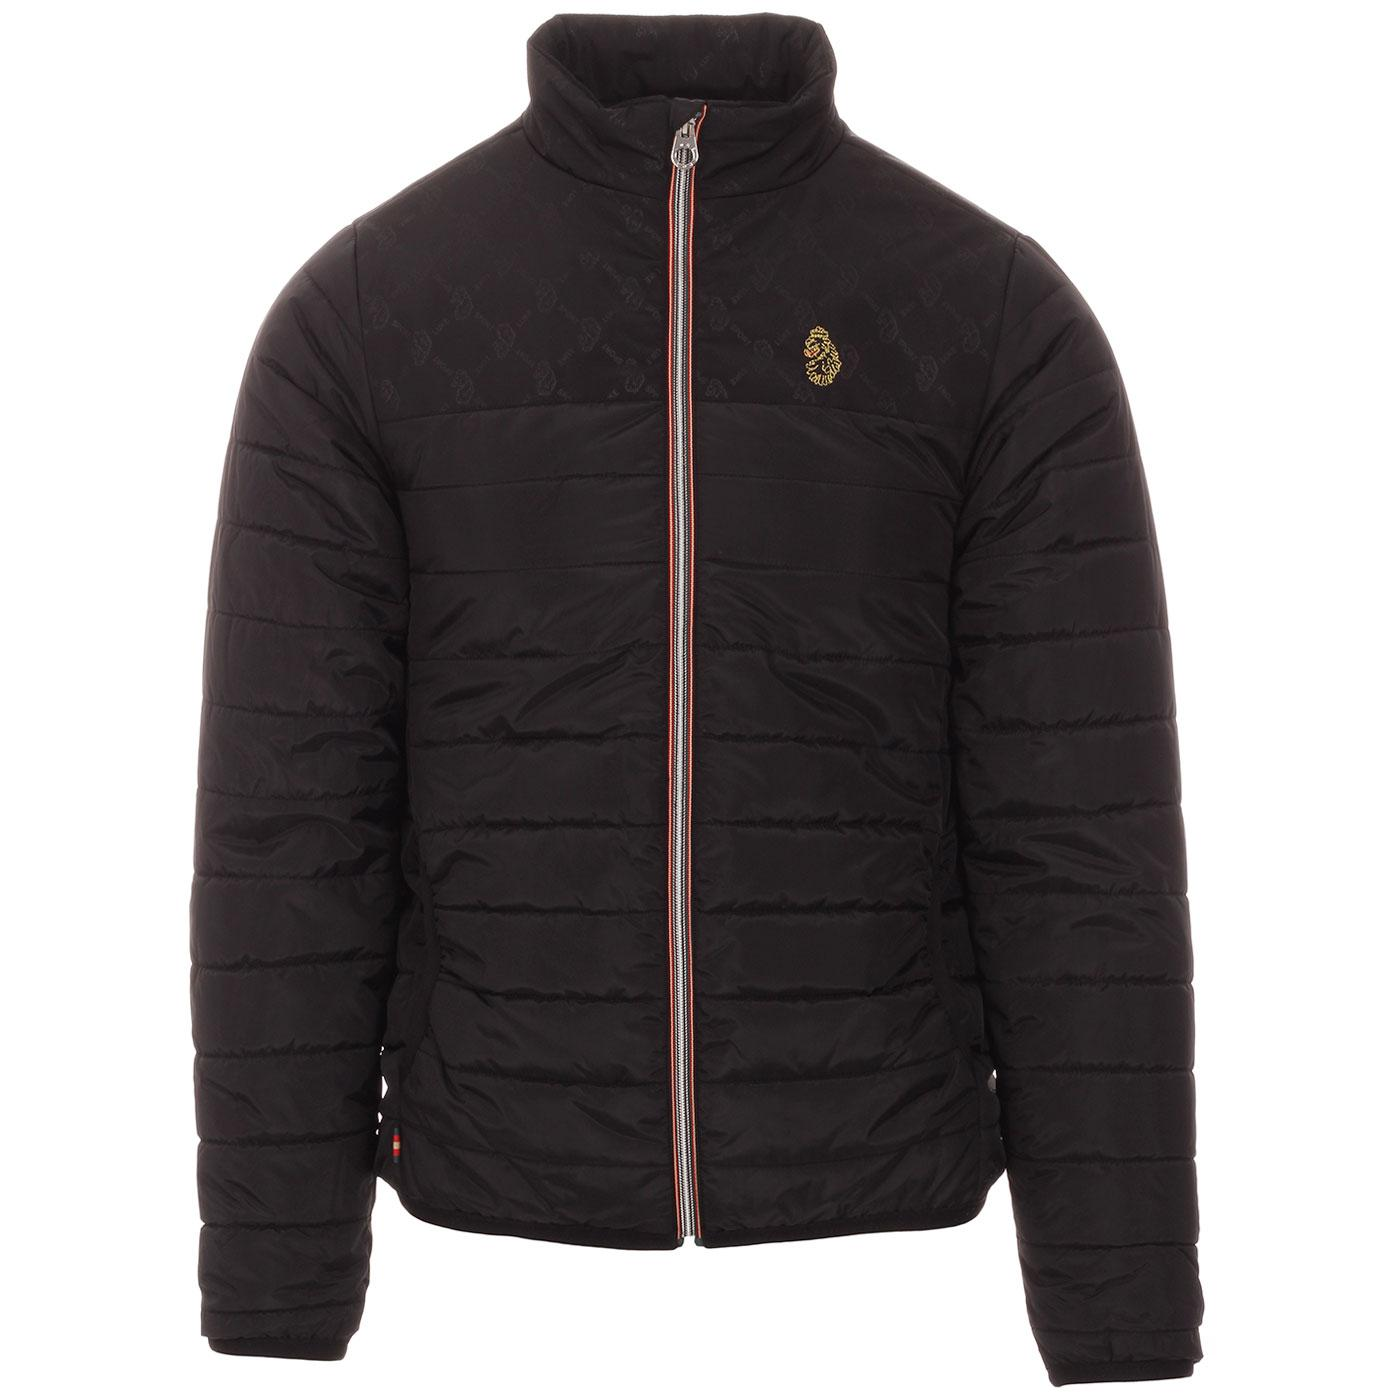 Sinartra Q LUKE Funnel Neck Quilted Jacket (Black)